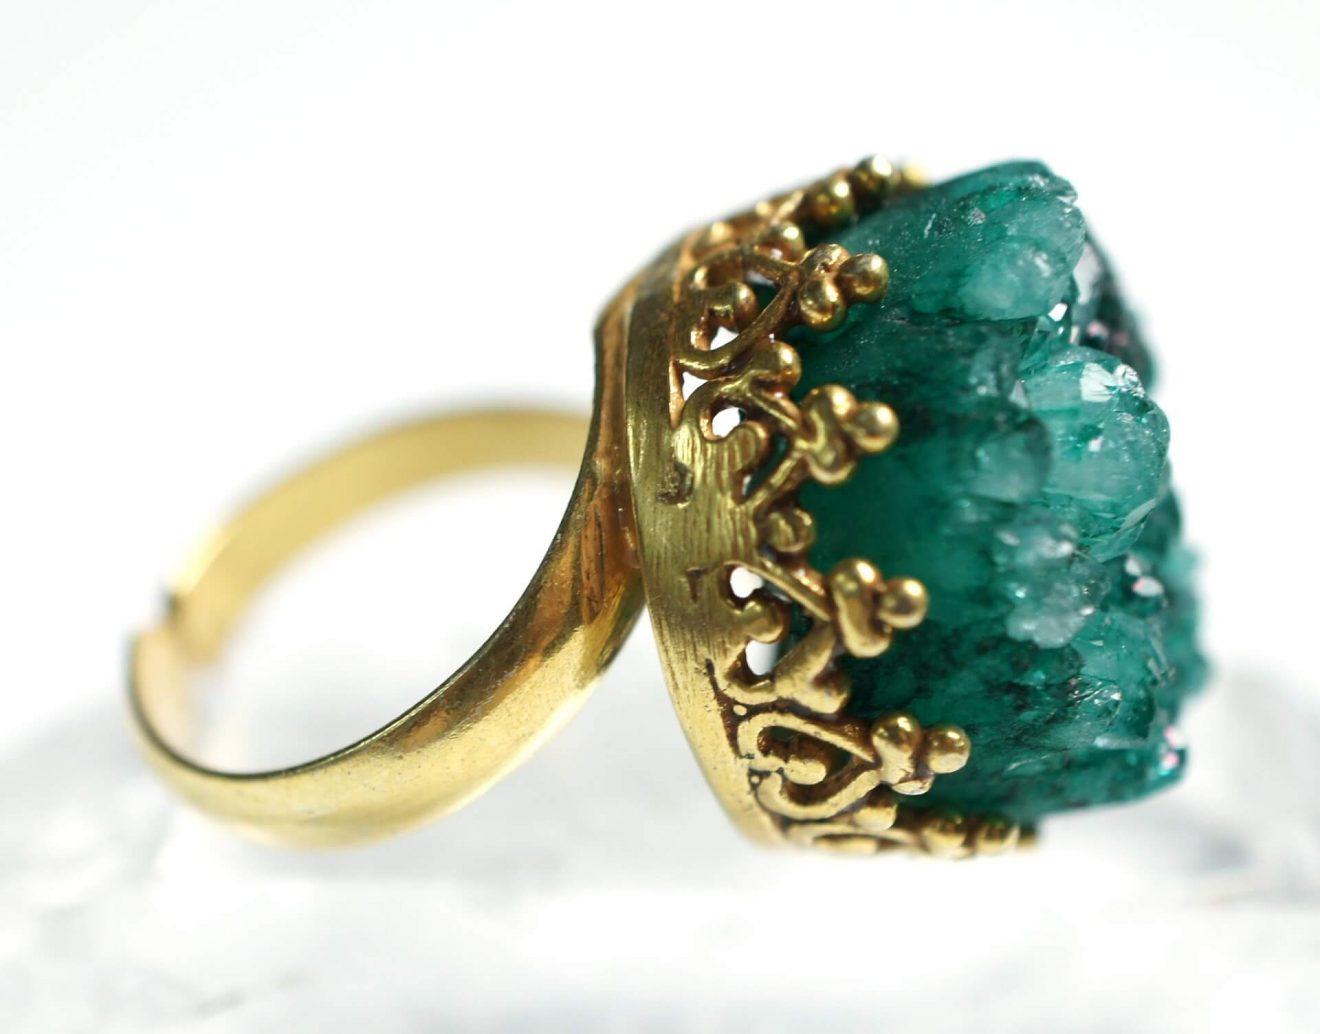 Green gemstones used in jewelry